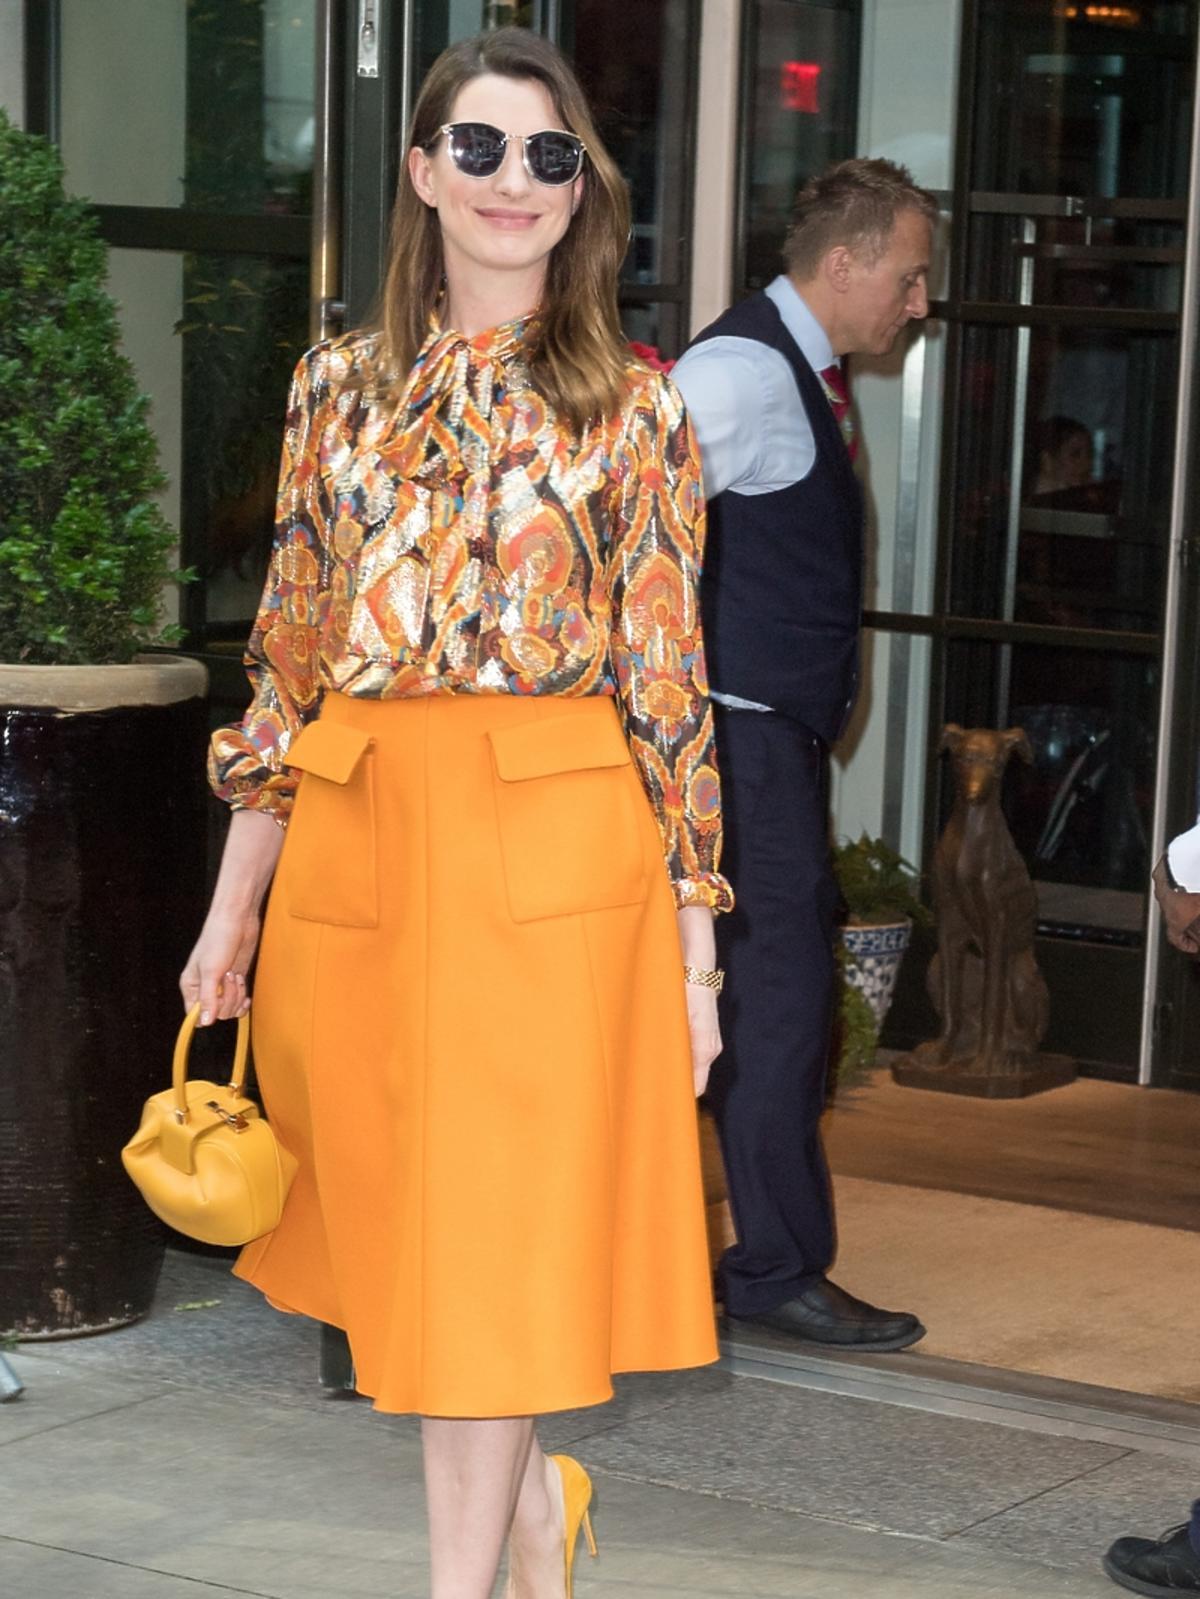 Anne Hathaway z torebką Gabriela Hearst